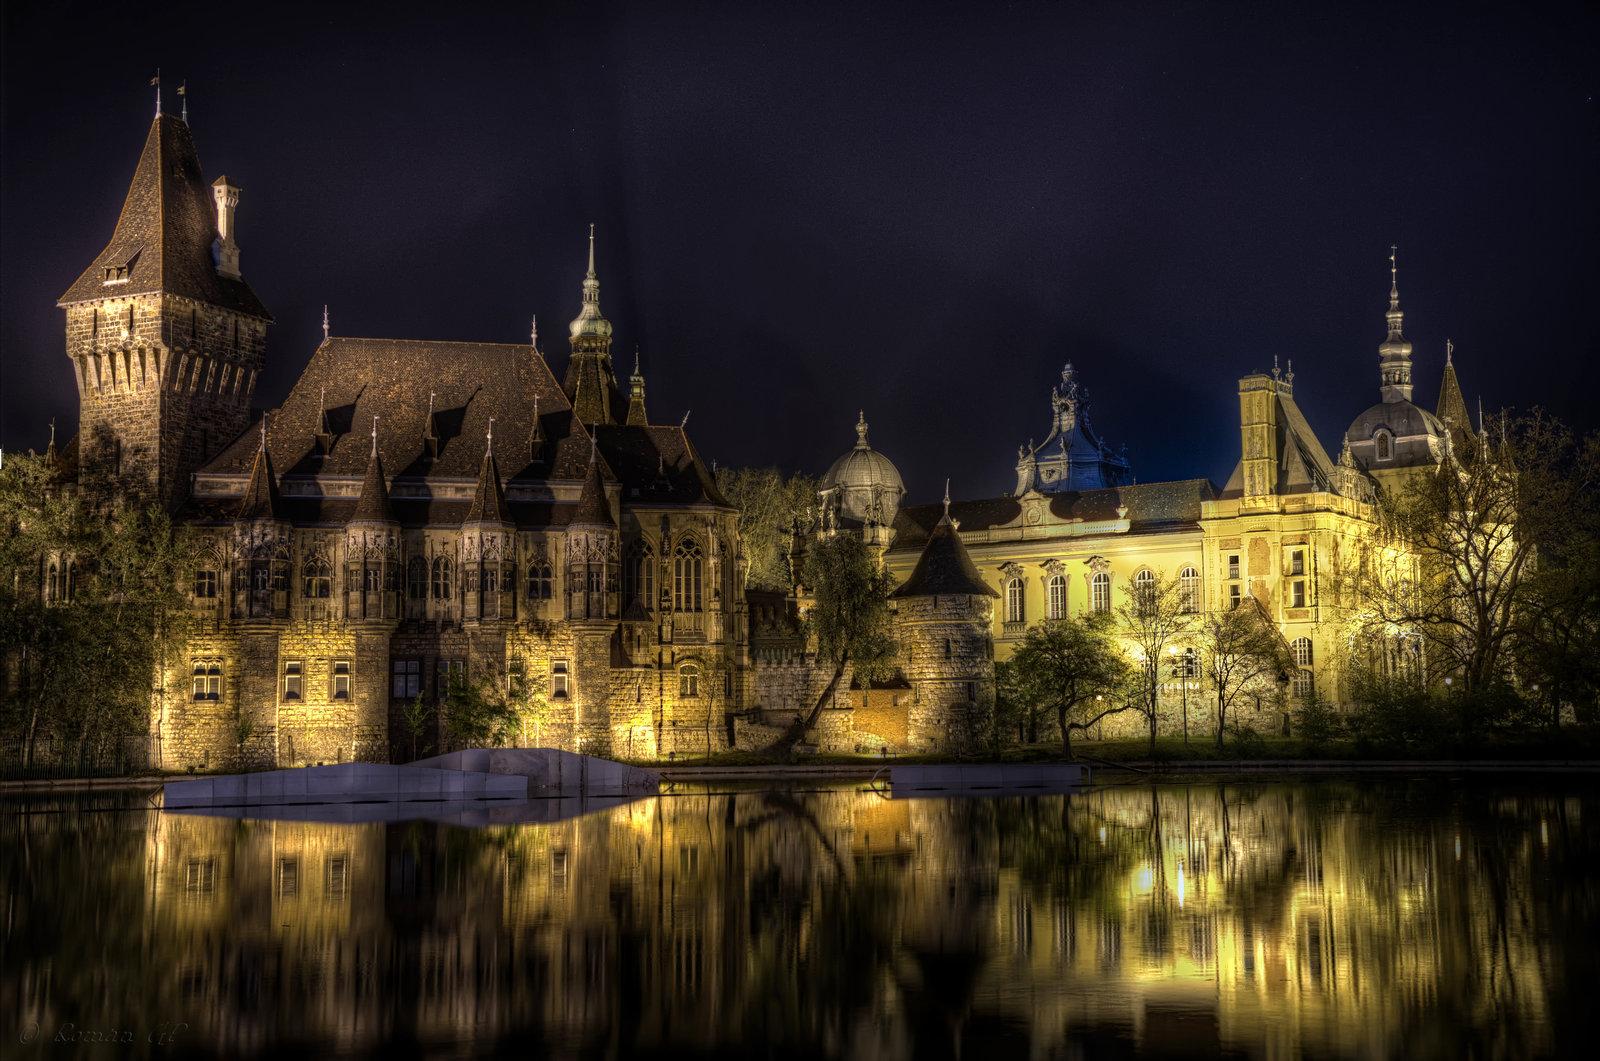 Vajdahunyad Castle Backgrounds, Compatible - PC, Mobile, Gadgets  1600x1061 px